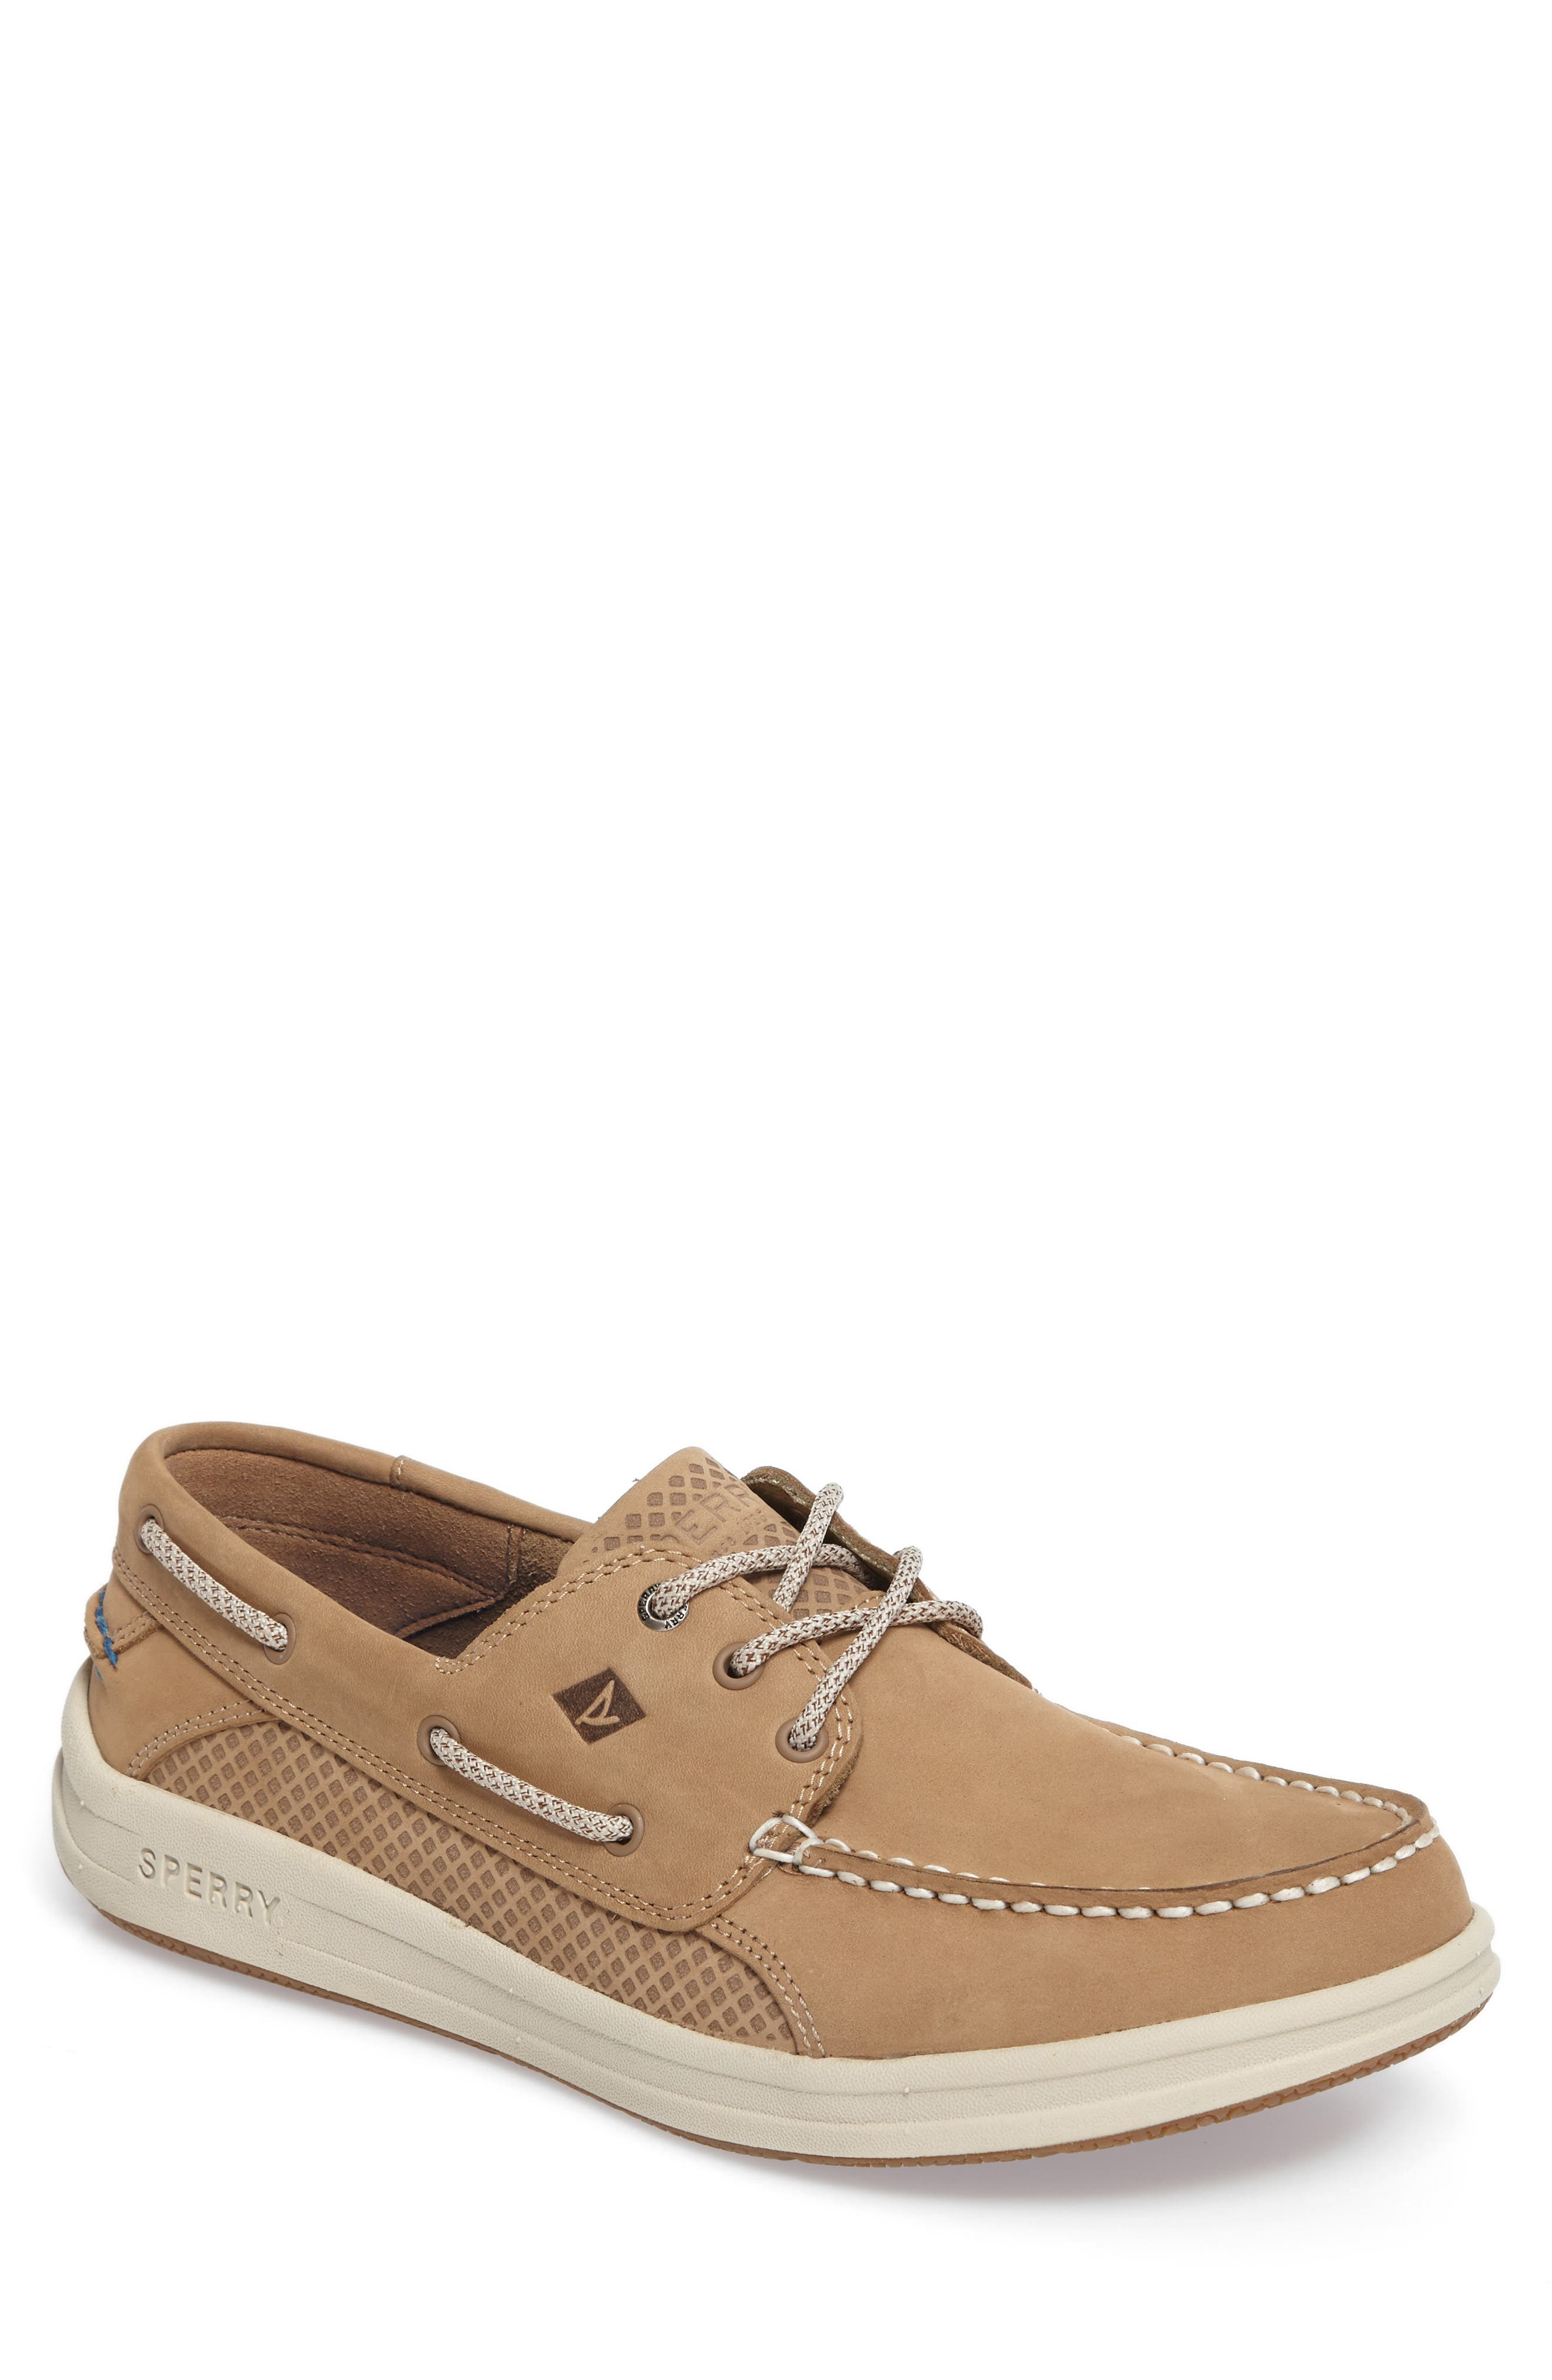 Gamefish Boat Shoe,                             Main thumbnail 1, color,                             Linen Leather